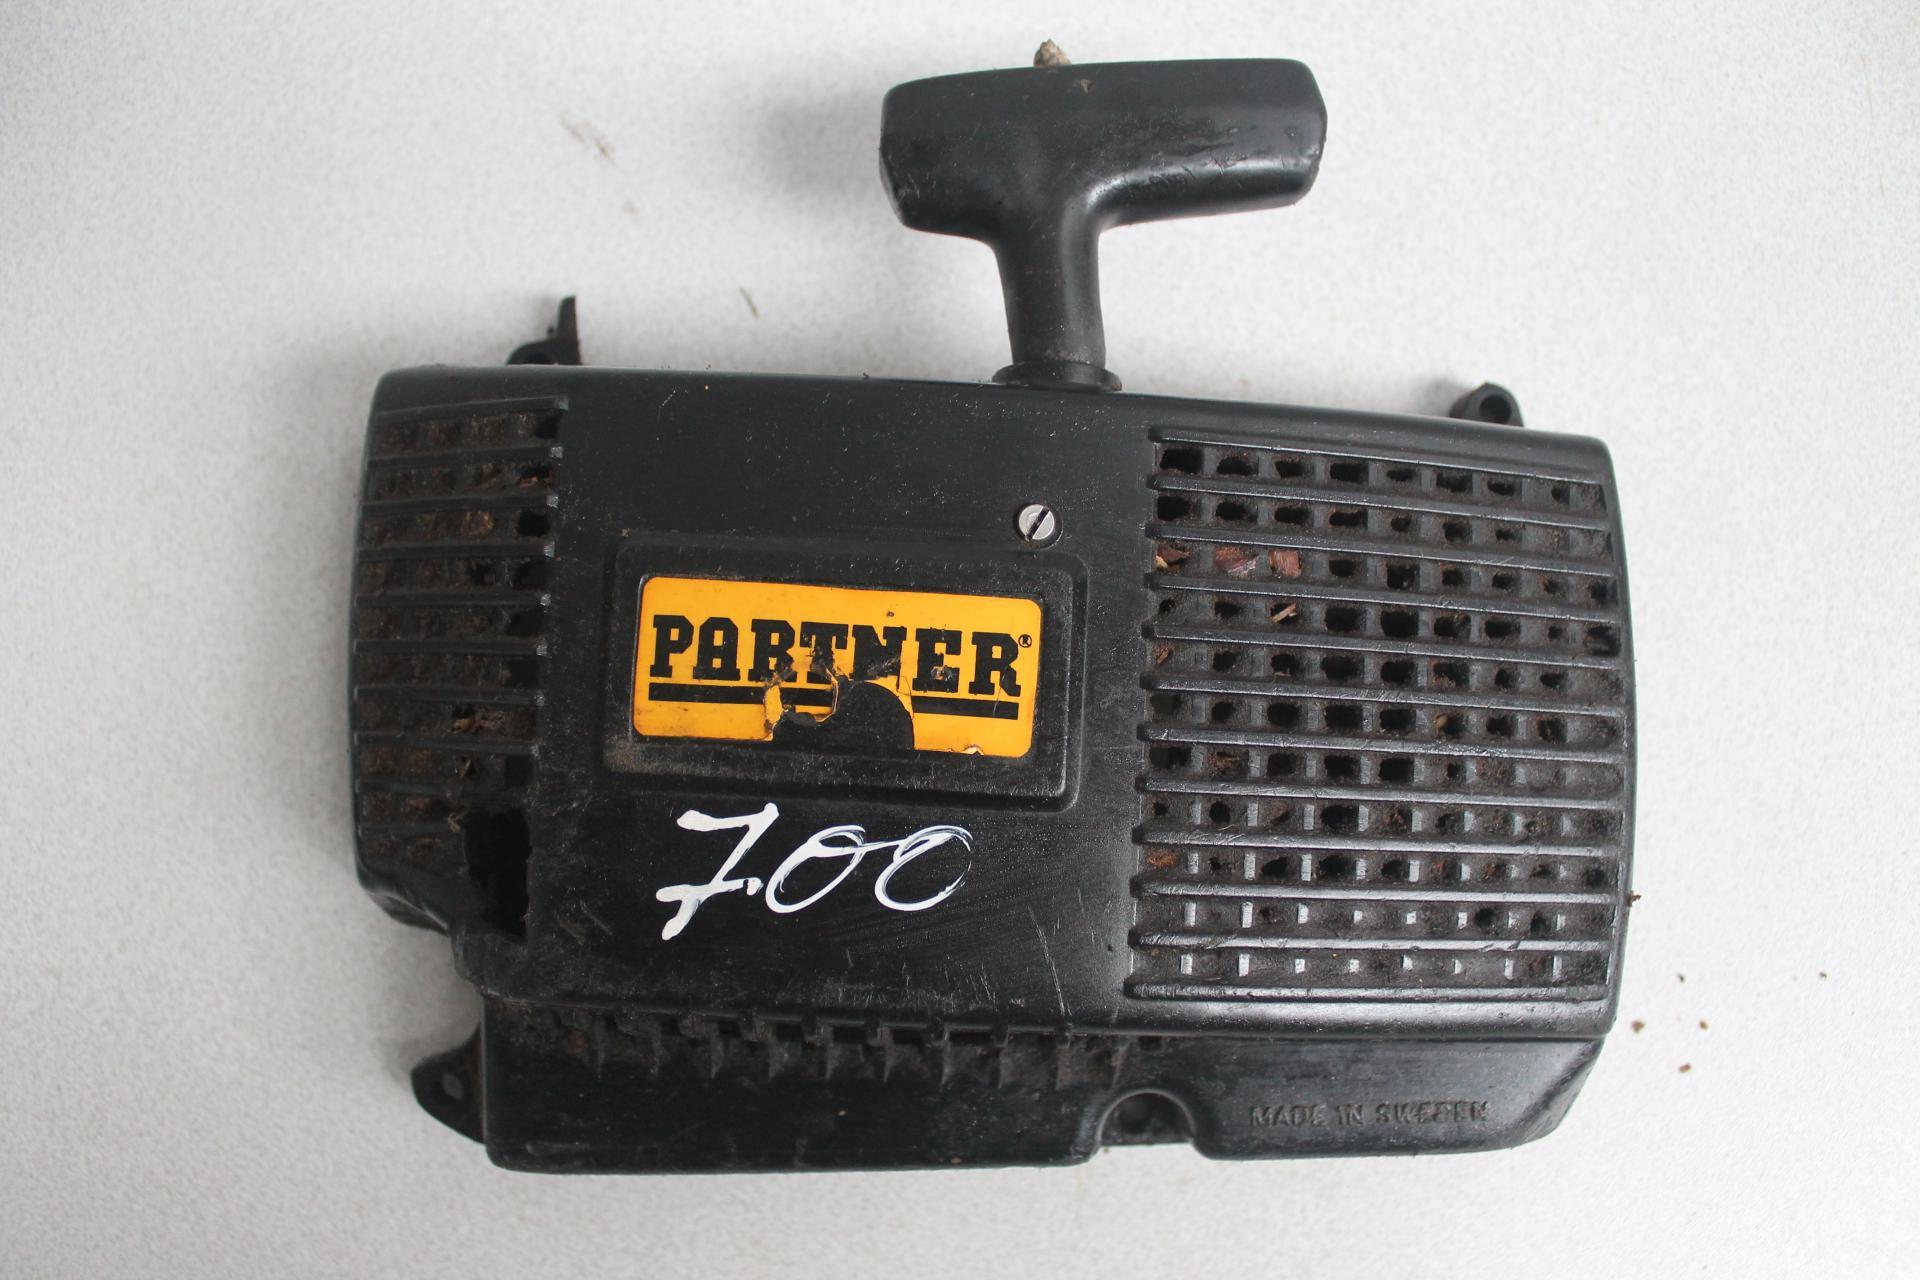 Arranque Partner 700